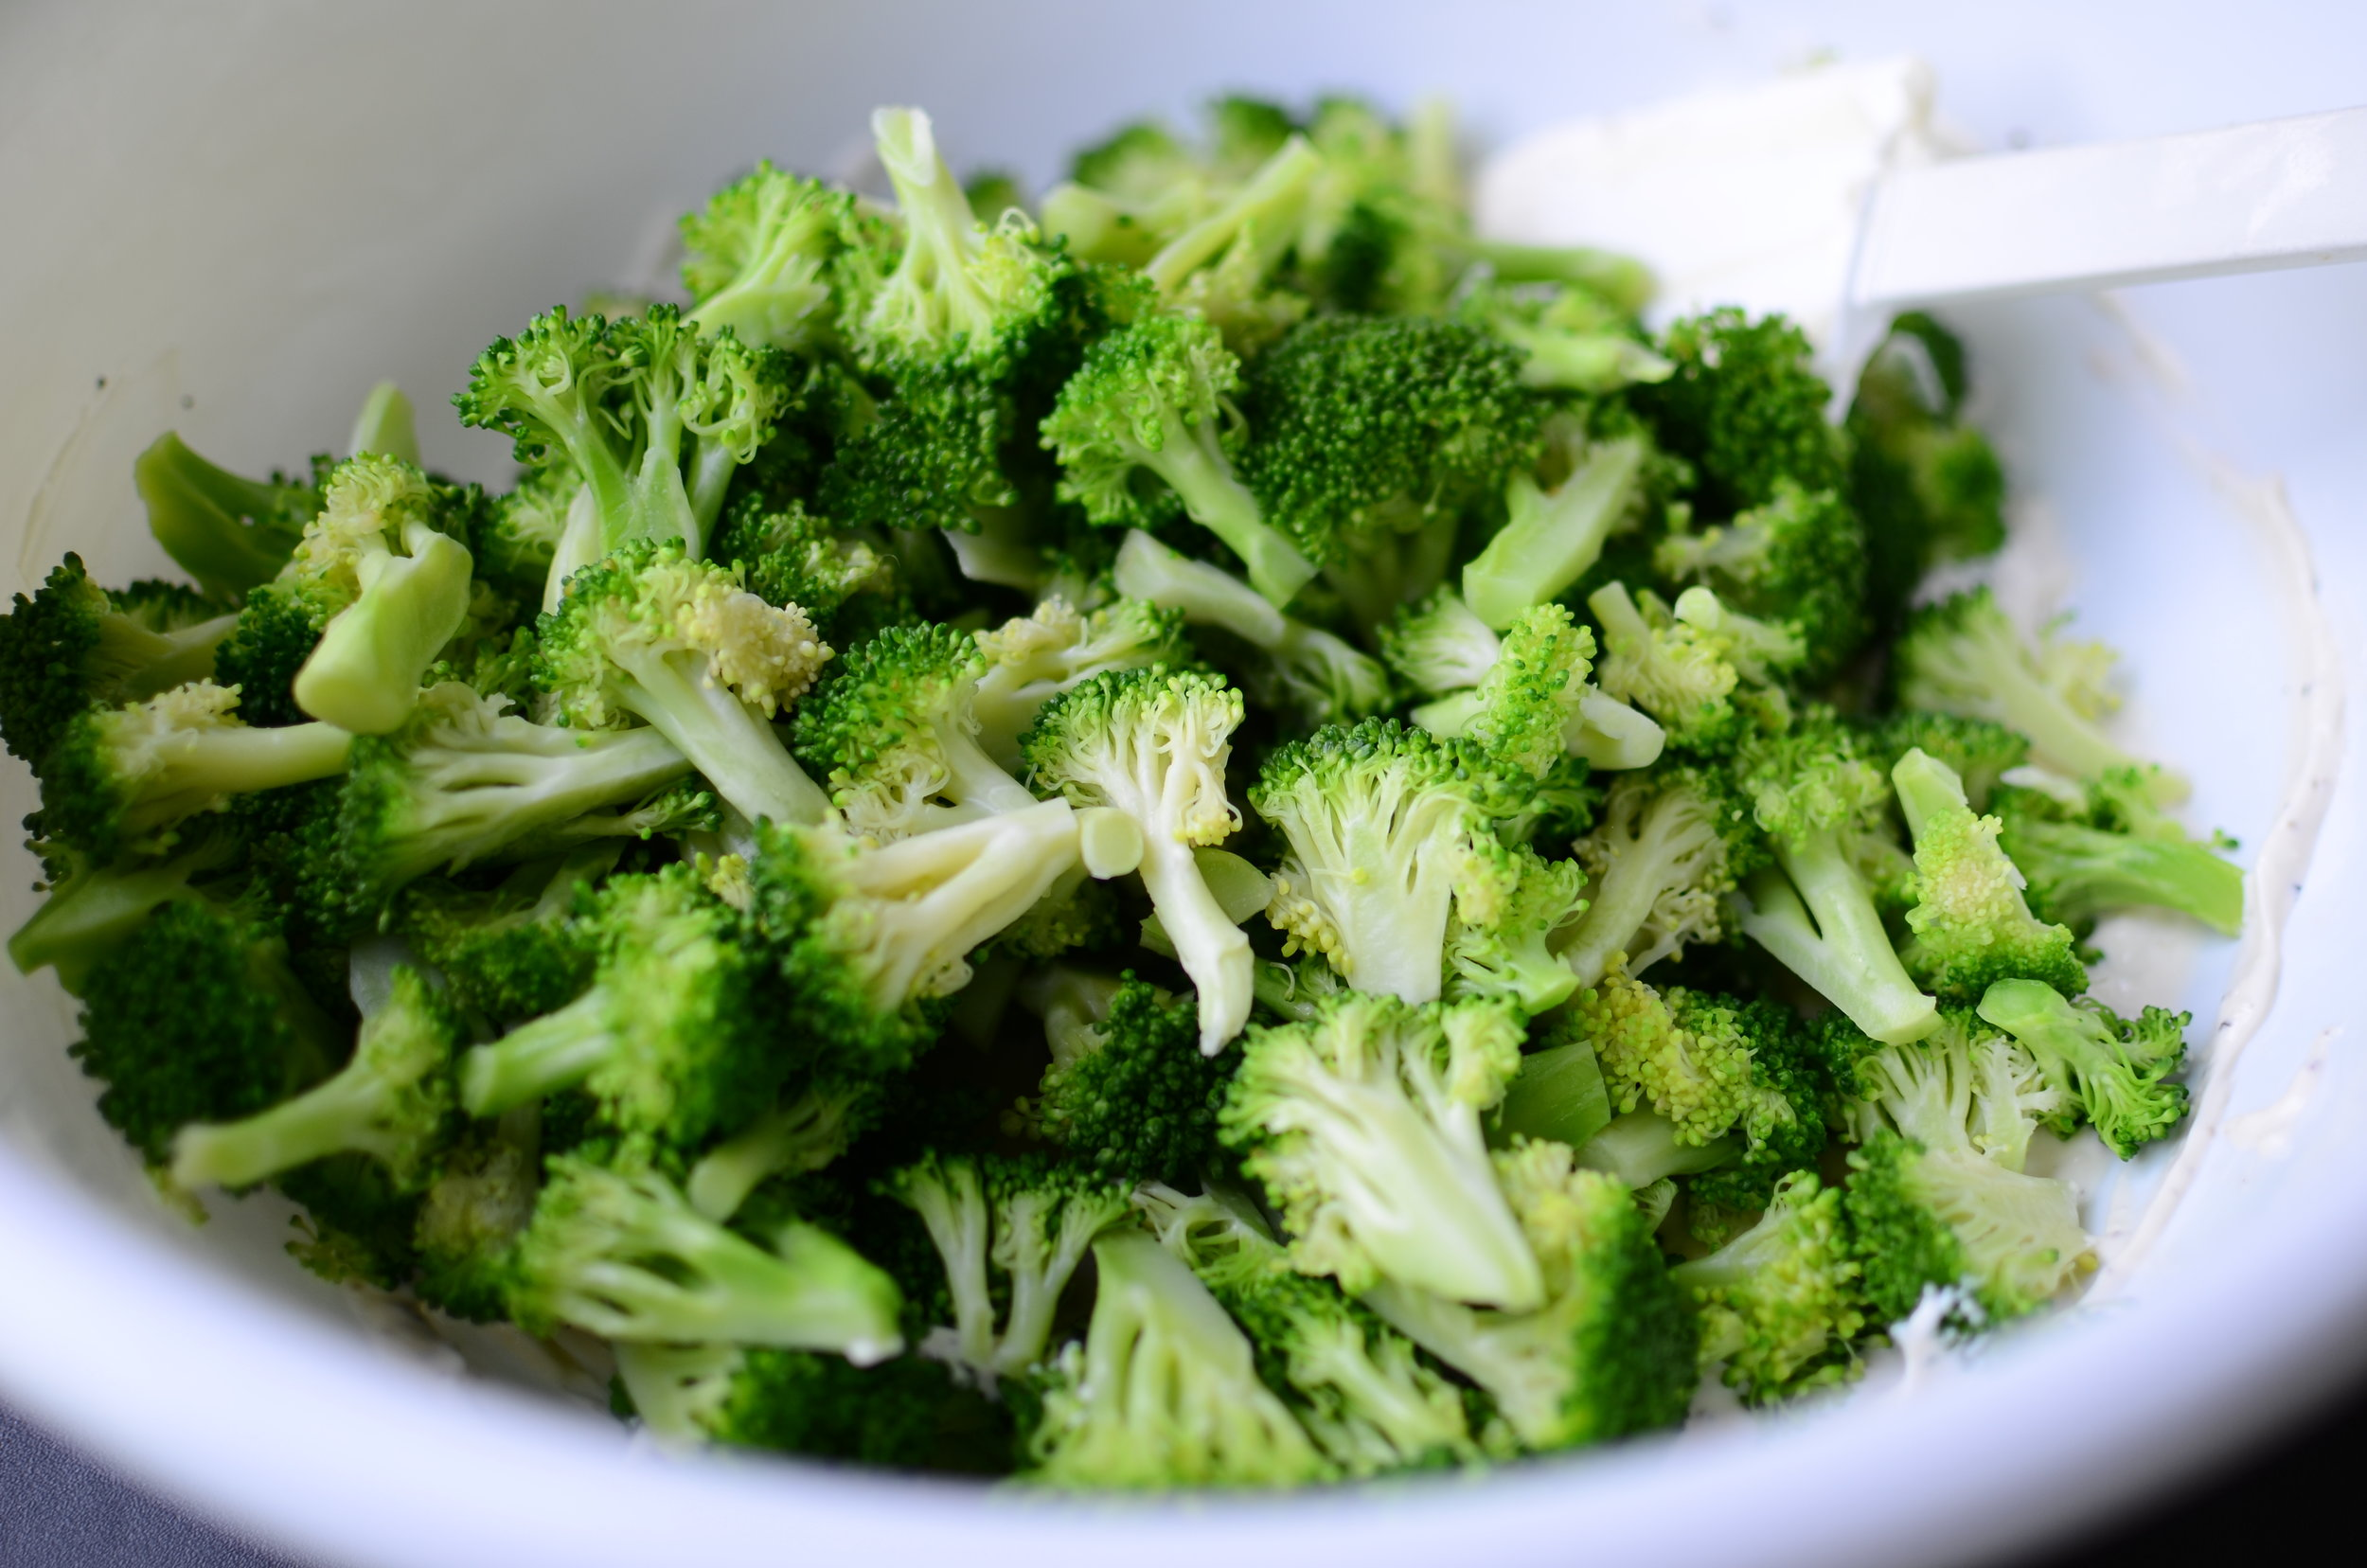 making-broccoli-salad-recipe-butteryum